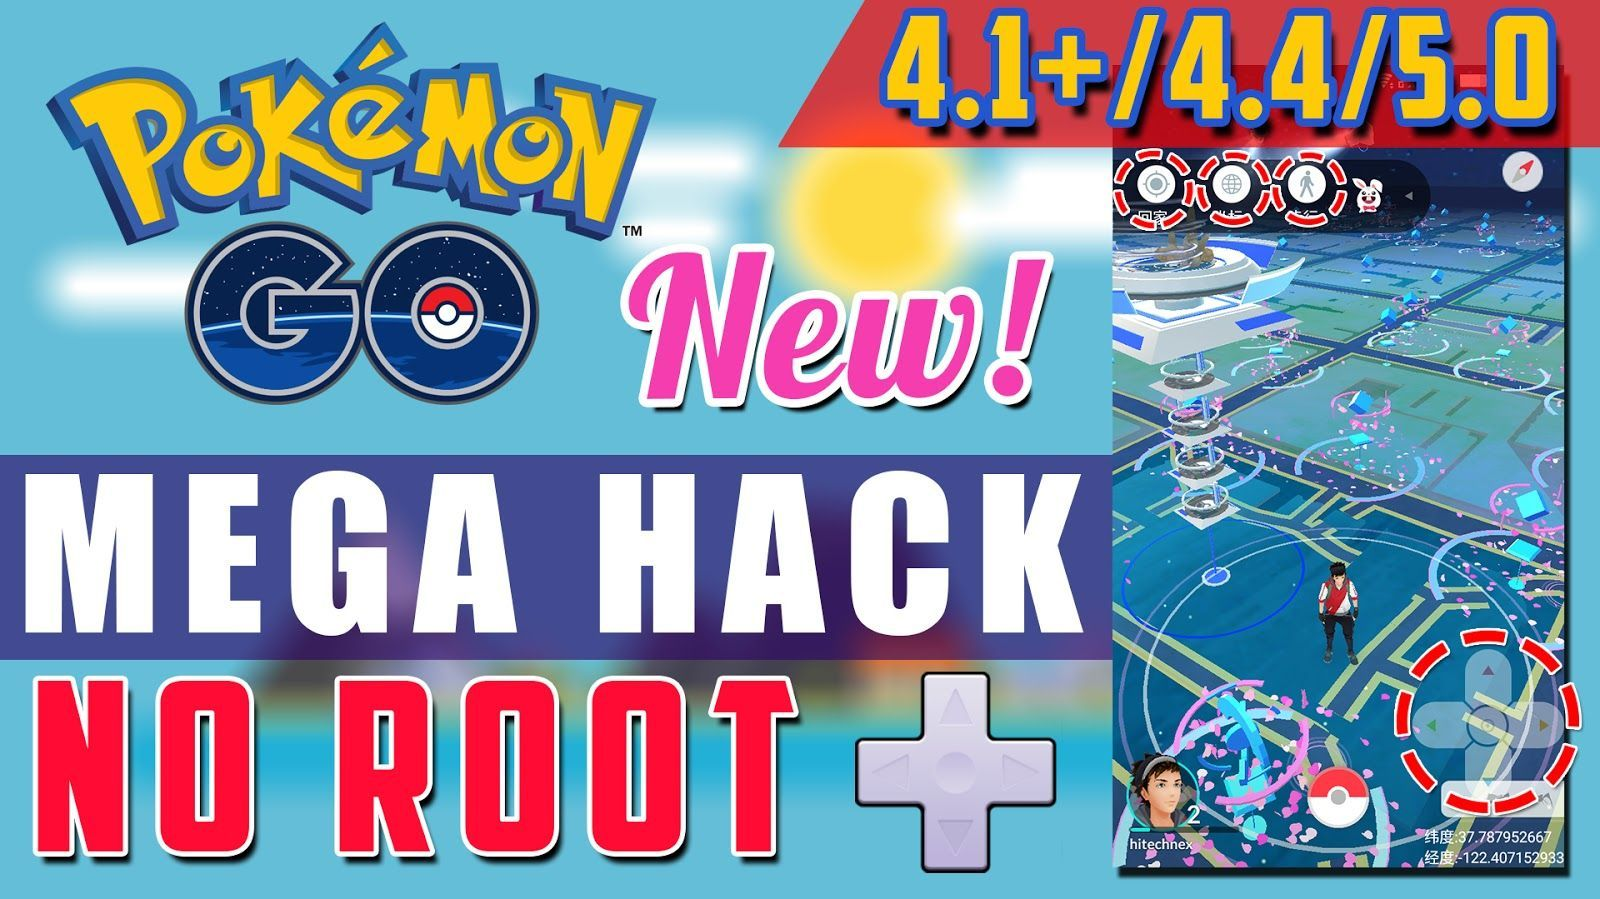 Pokemon Go Hack ? Add Unlimited PokeCoins 1 Minute! No